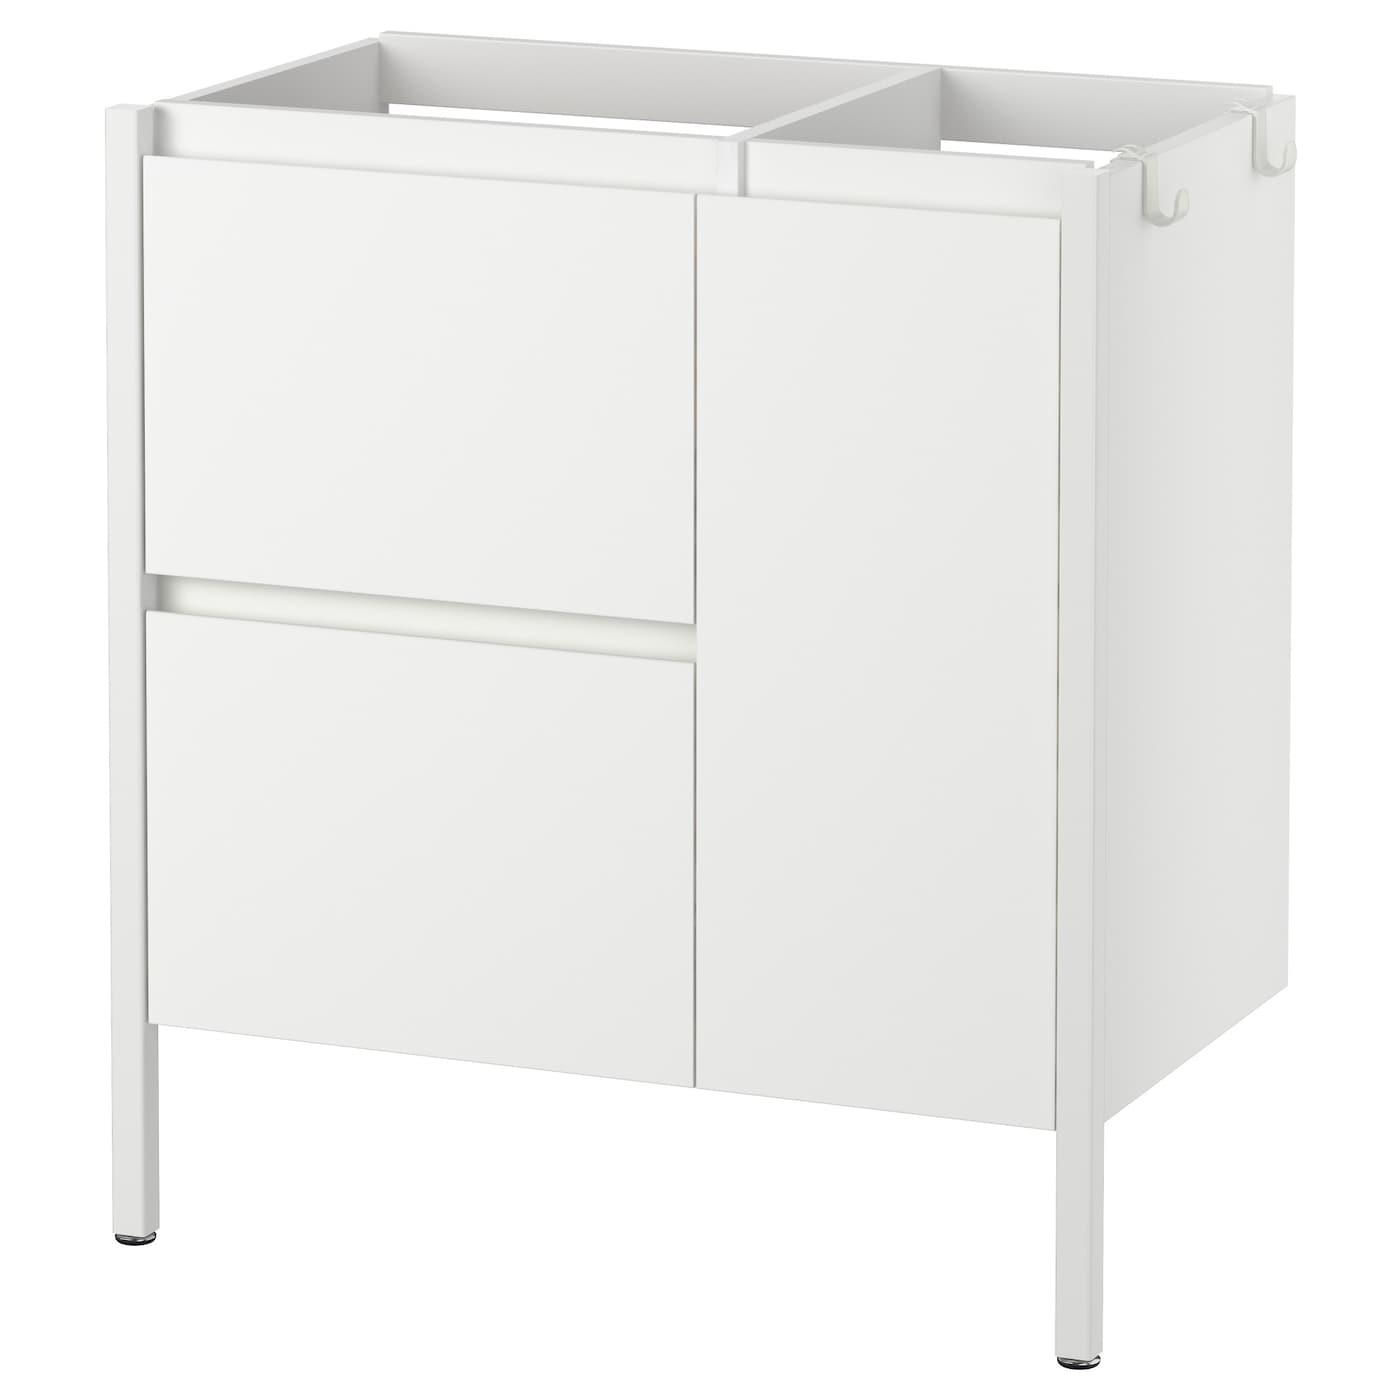 yddingen kast voor wastafel wit 70x76 cm ikea. Black Bedroom Furniture Sets. Home Design Ideas